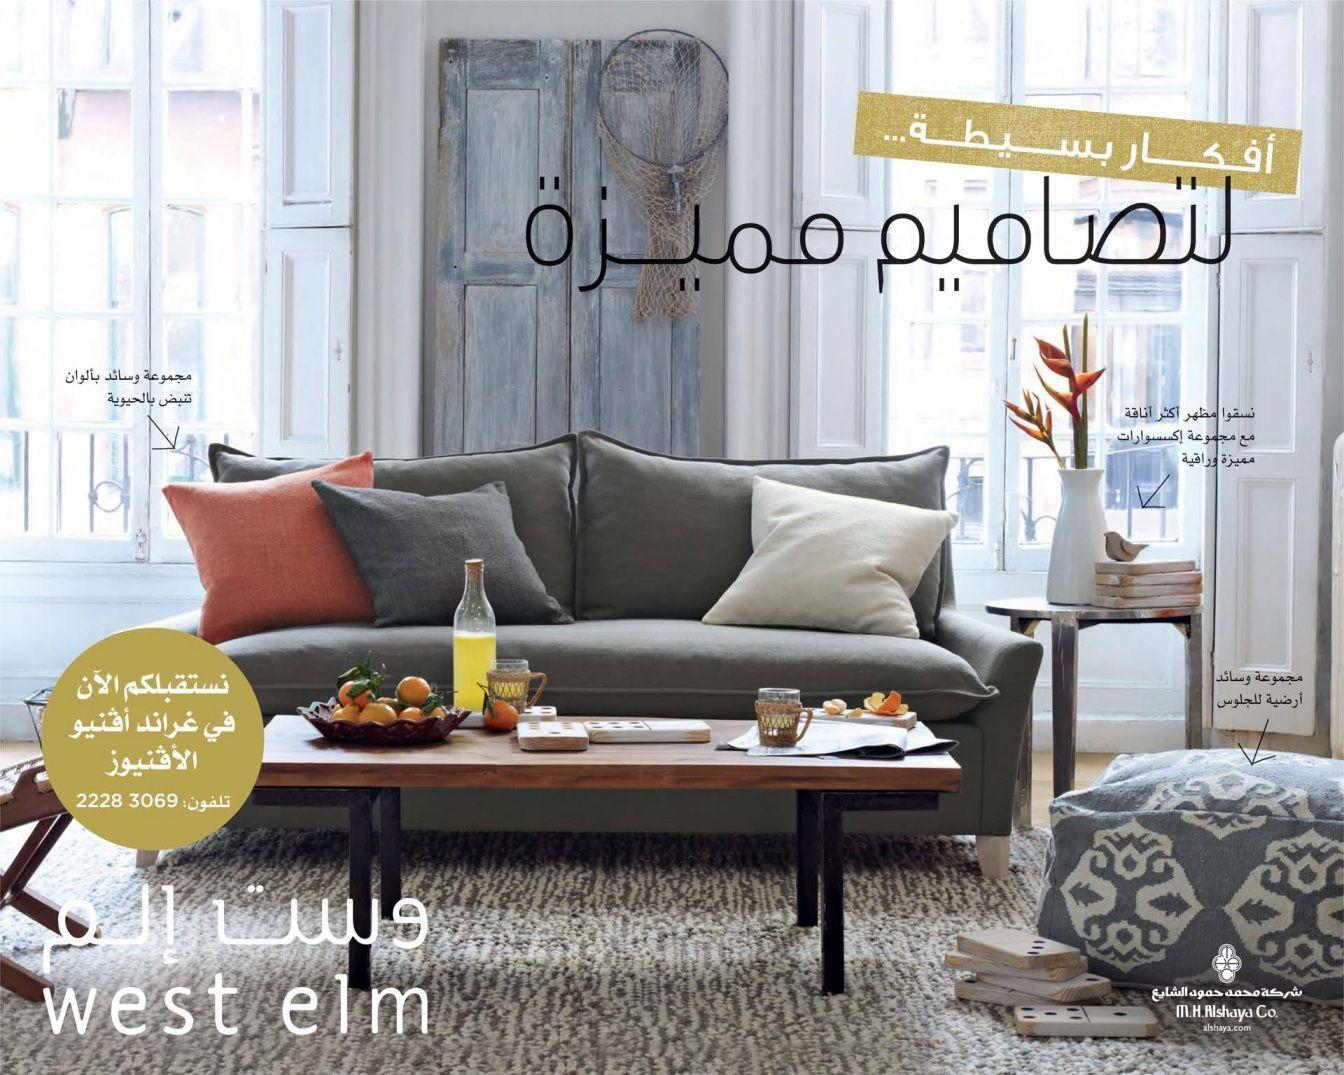 Westelm west elm modern furniture and home decor